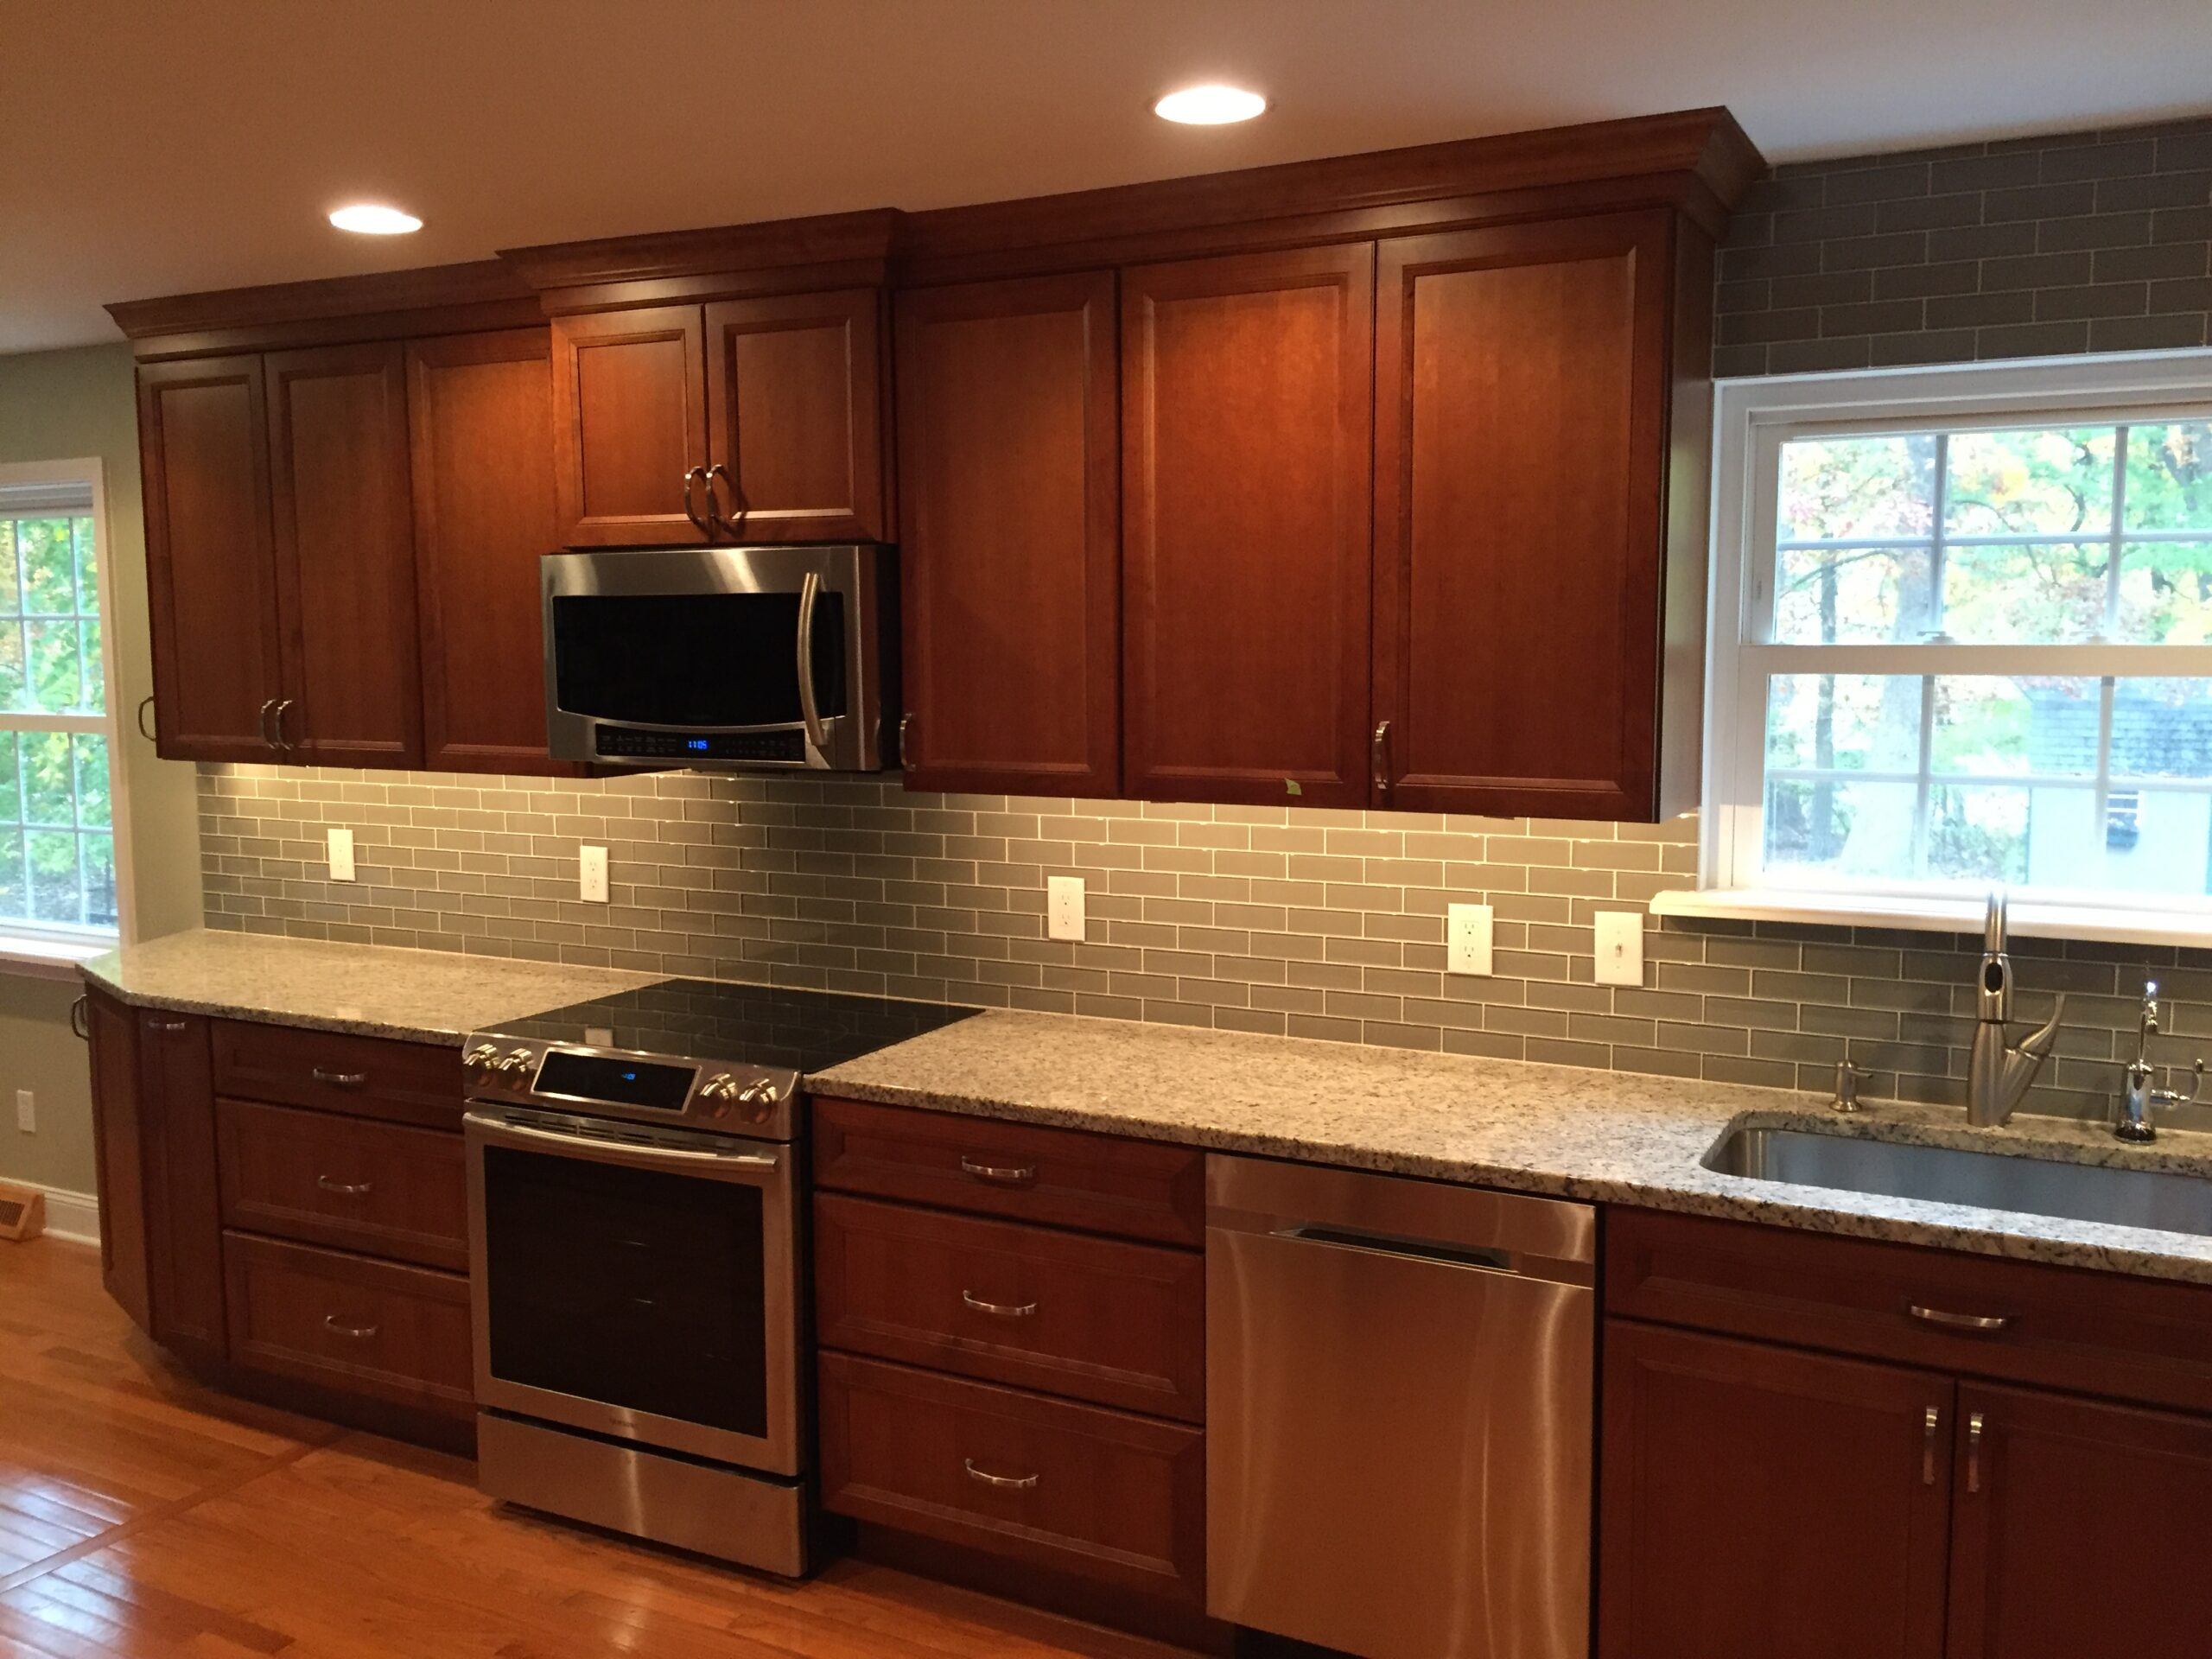 Kitchencabinet renovation PA